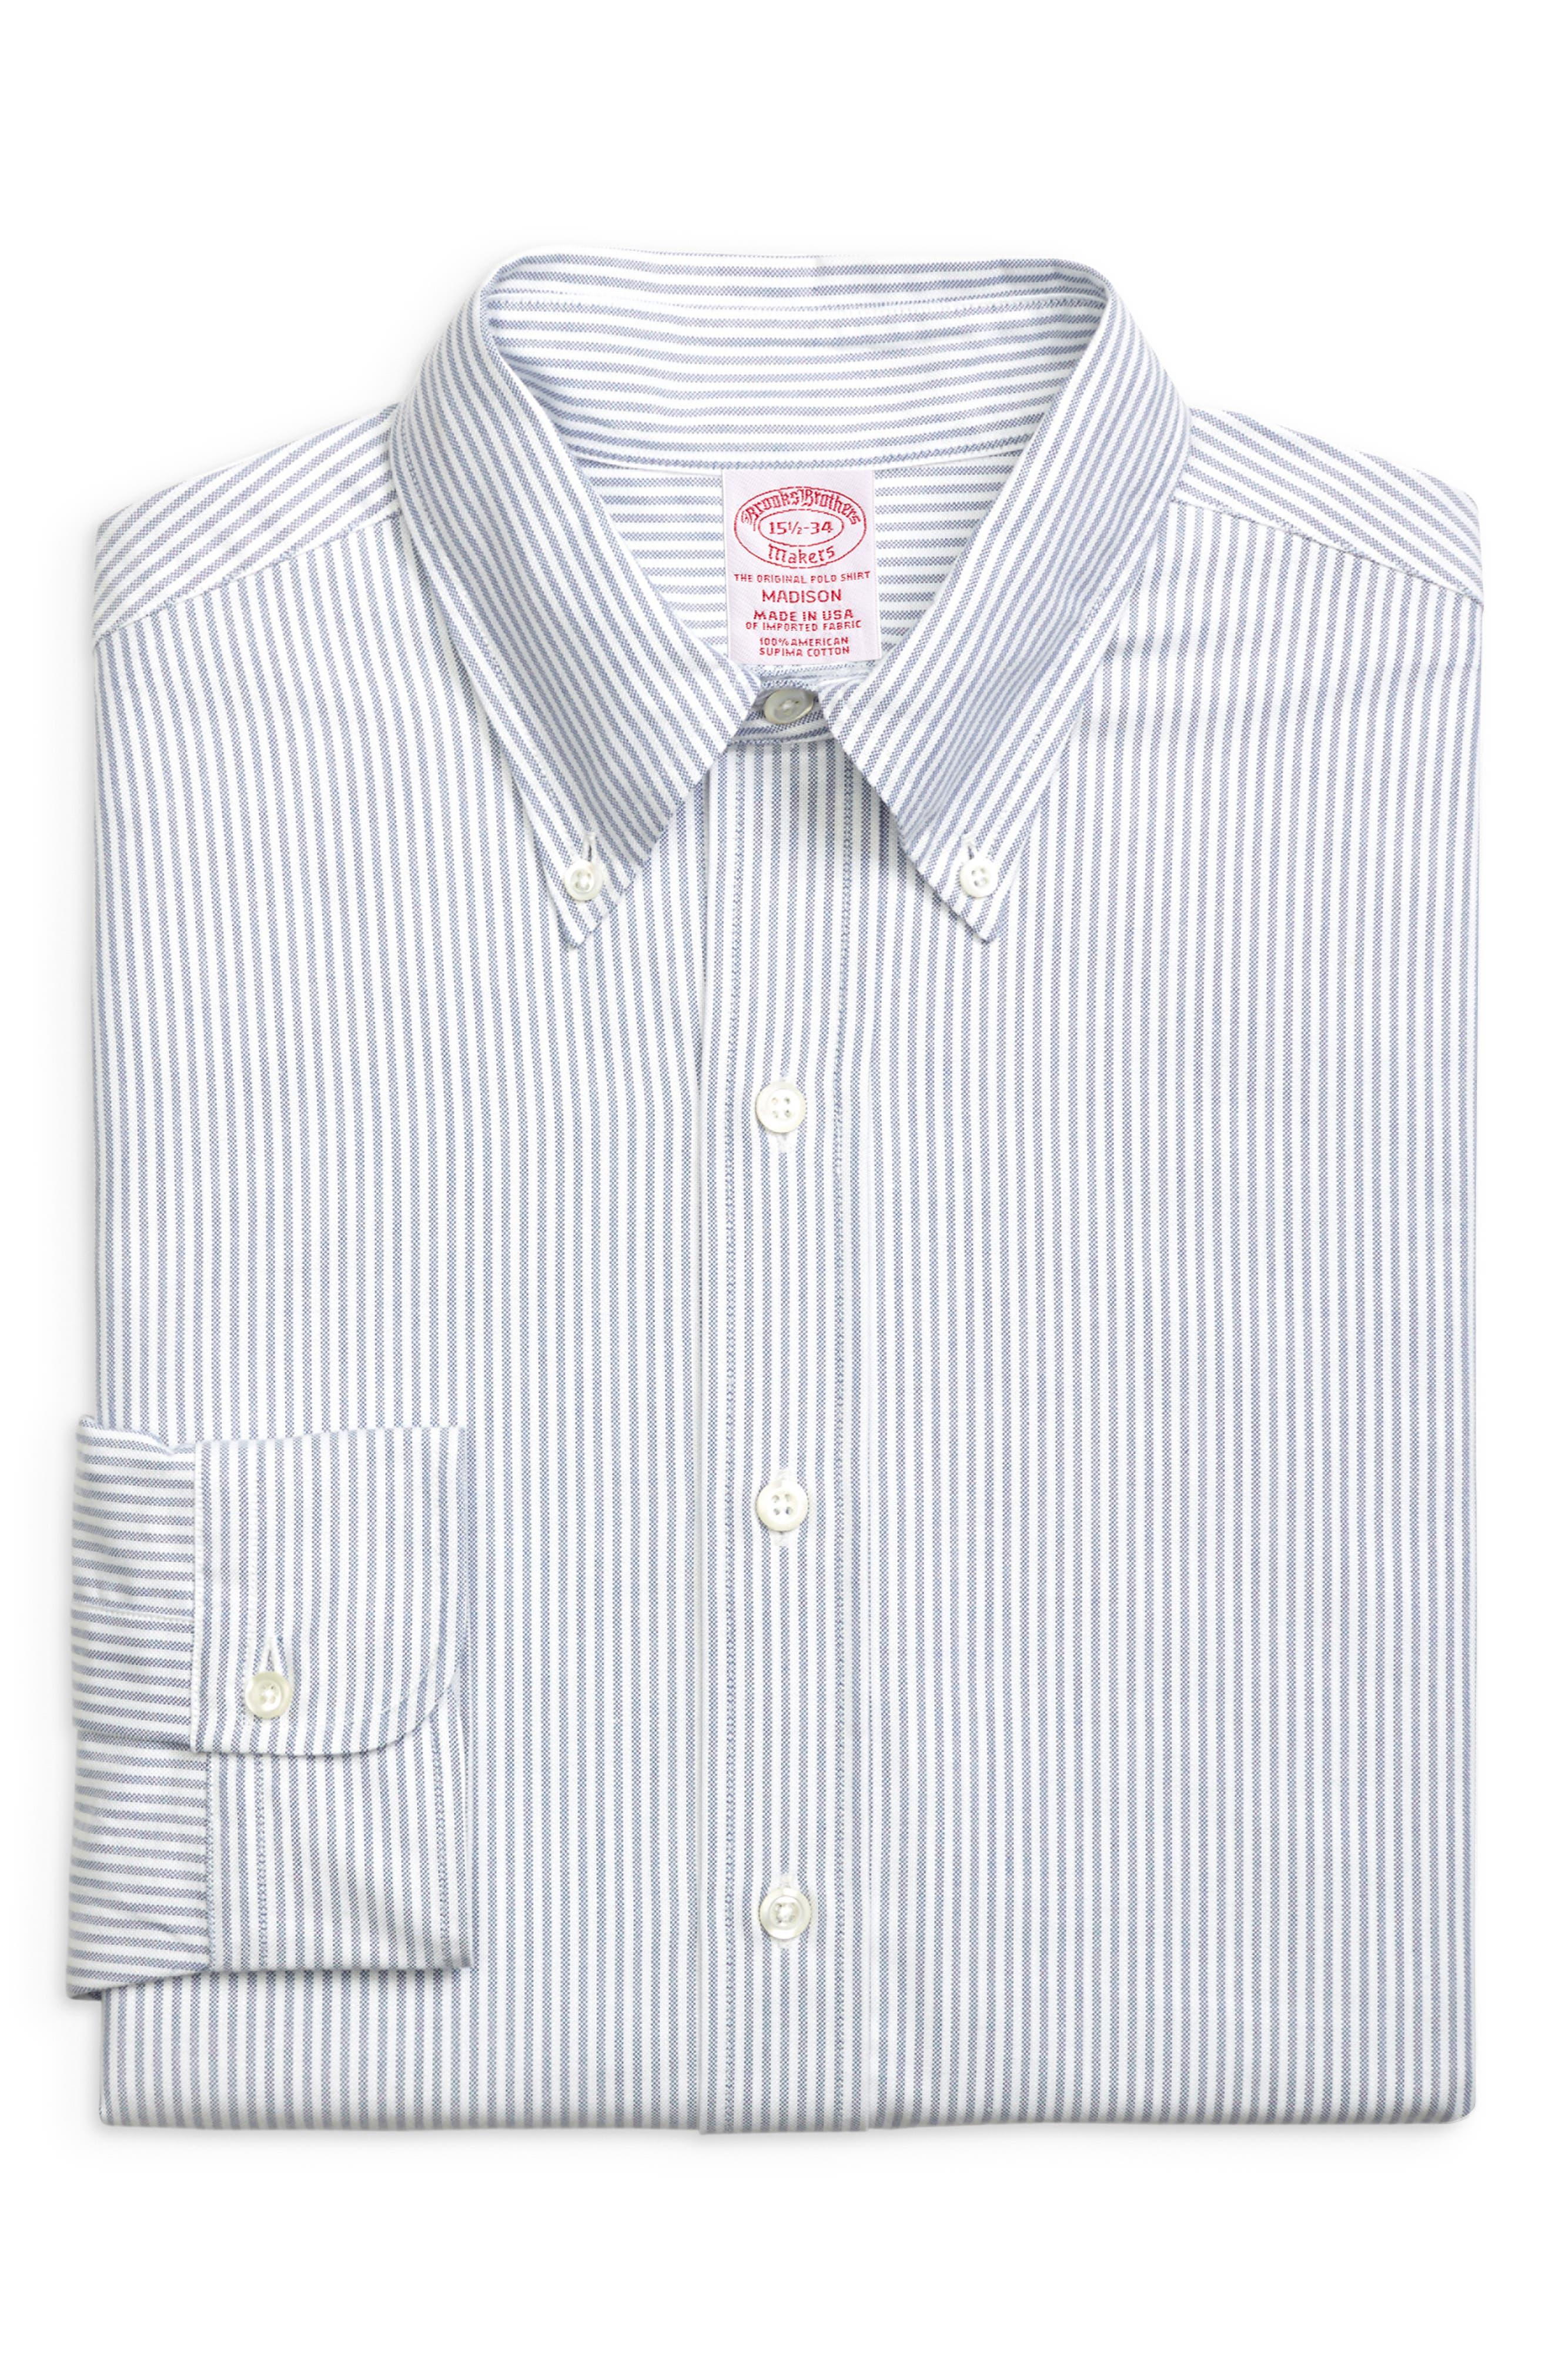 Madison Classic Fit Stripe Dress Shirt